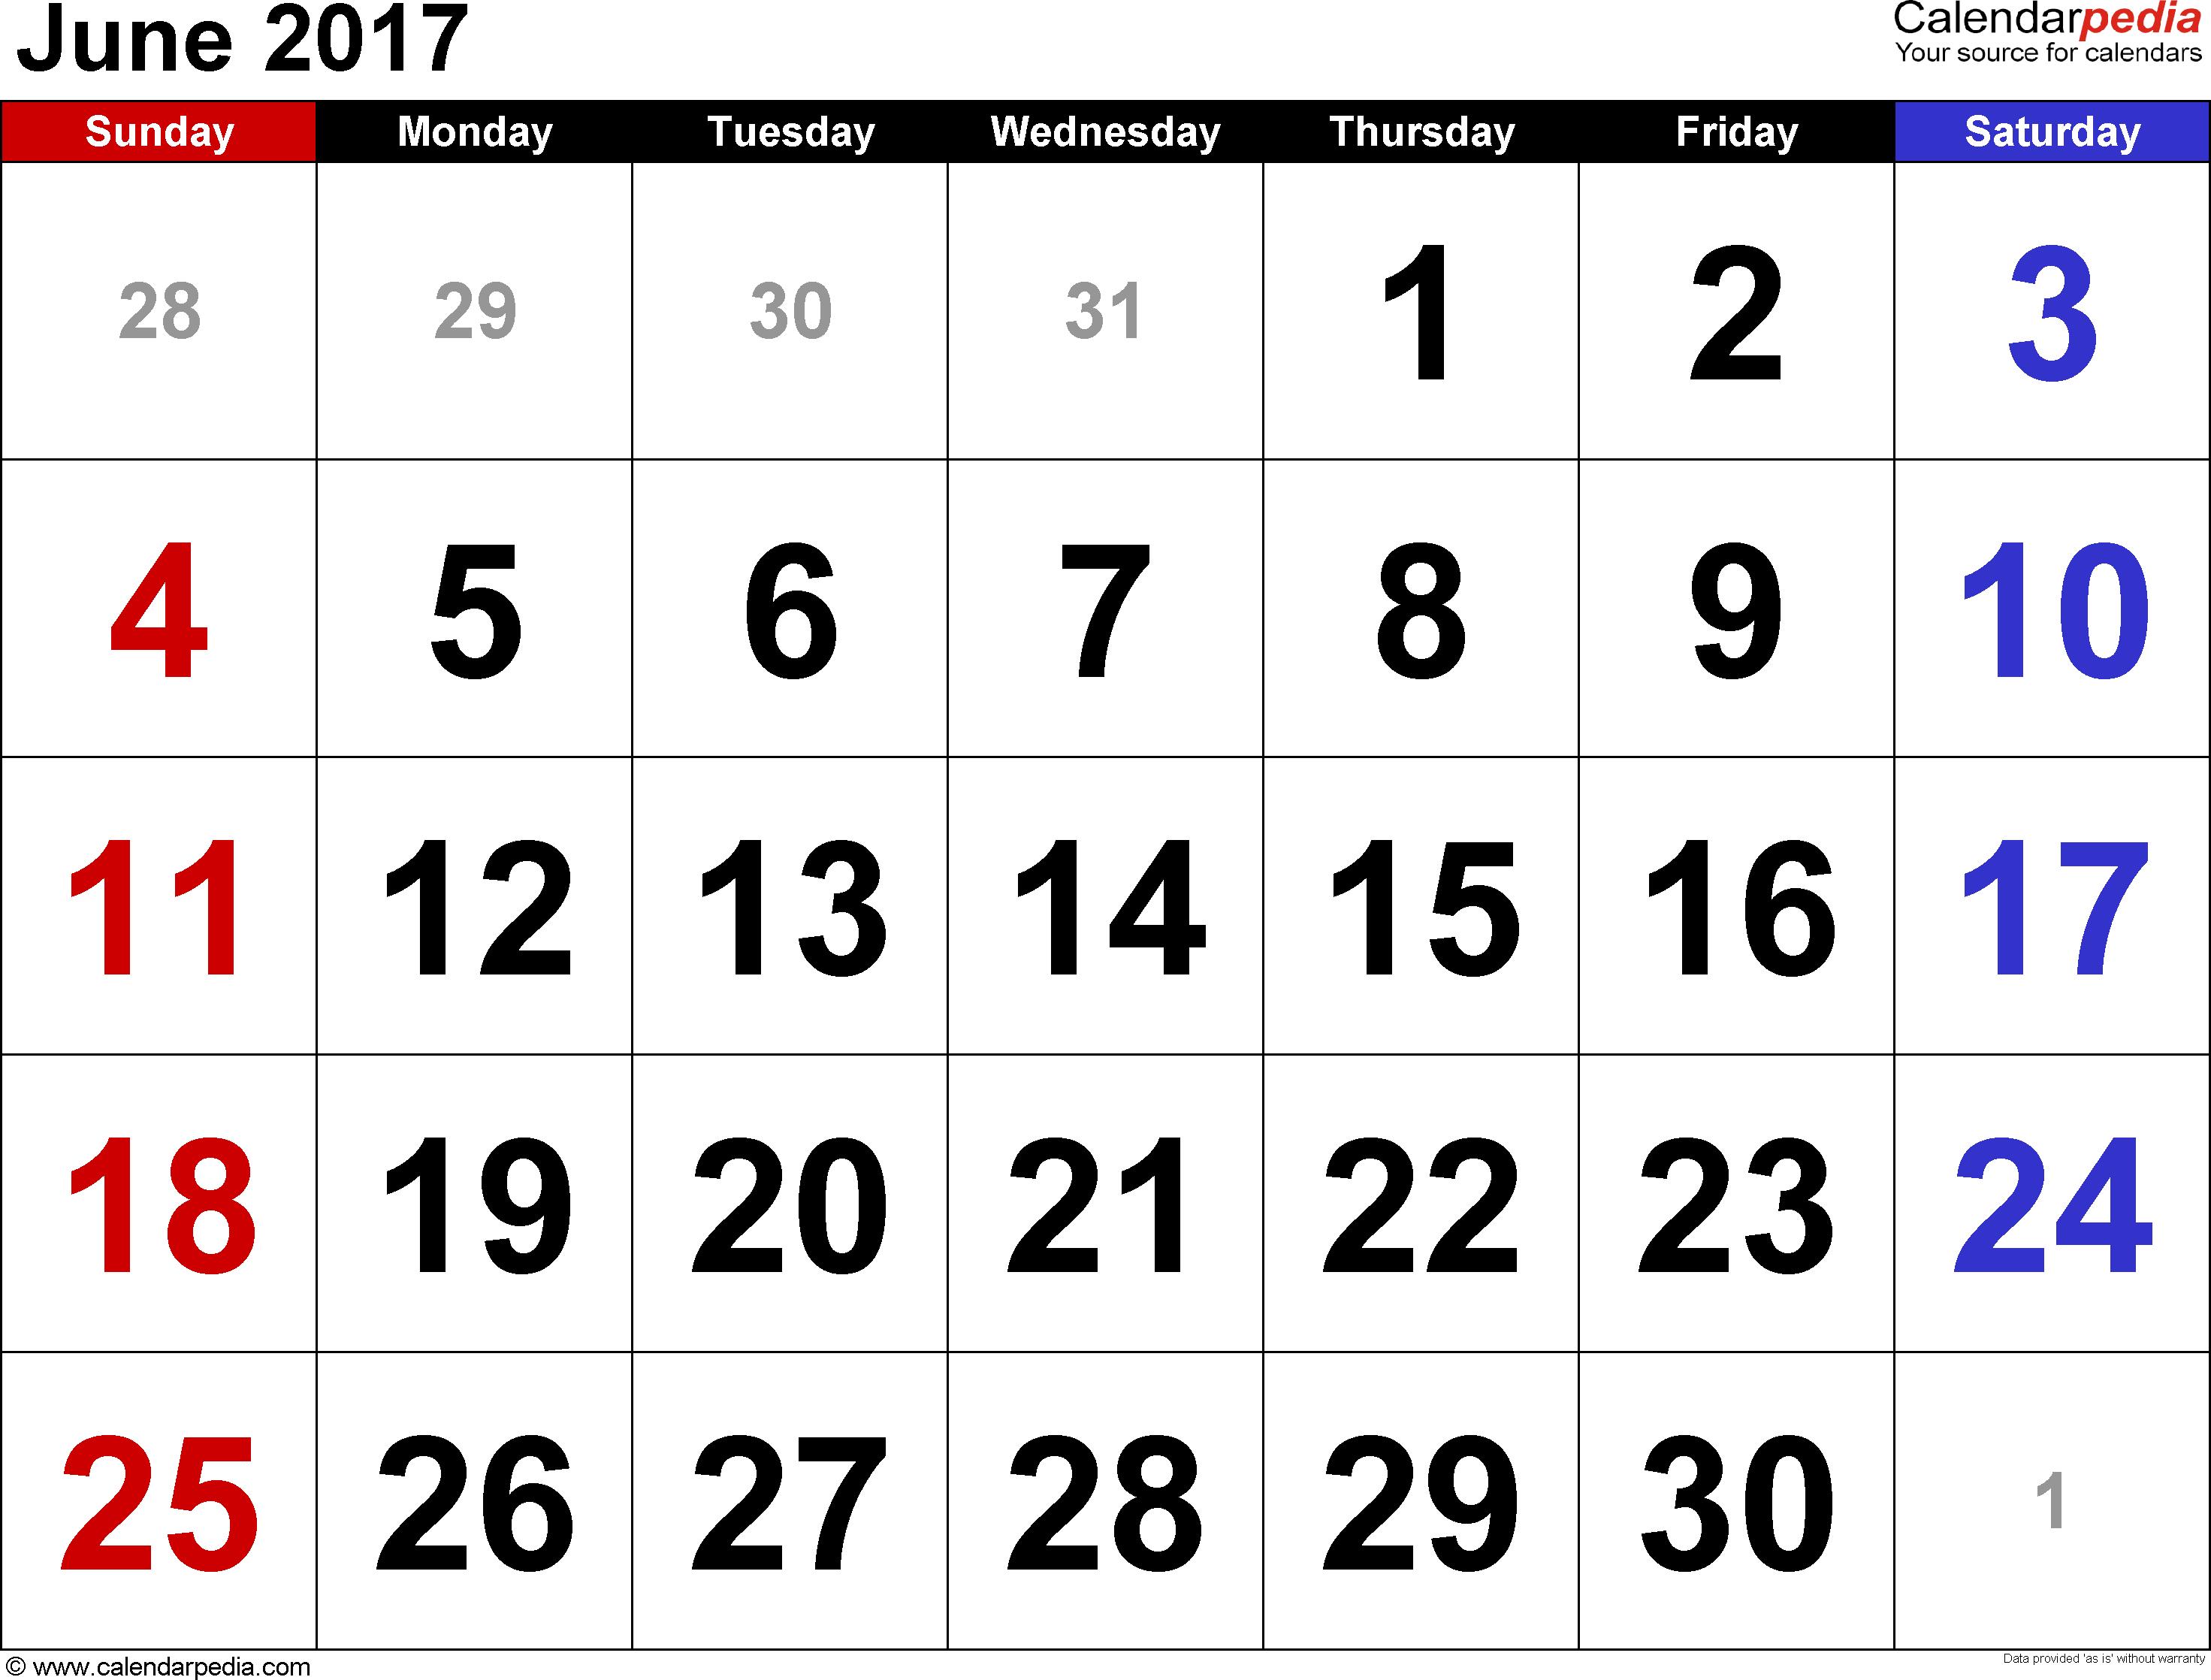 June 2017 Calendars for Word, Excel & PDF